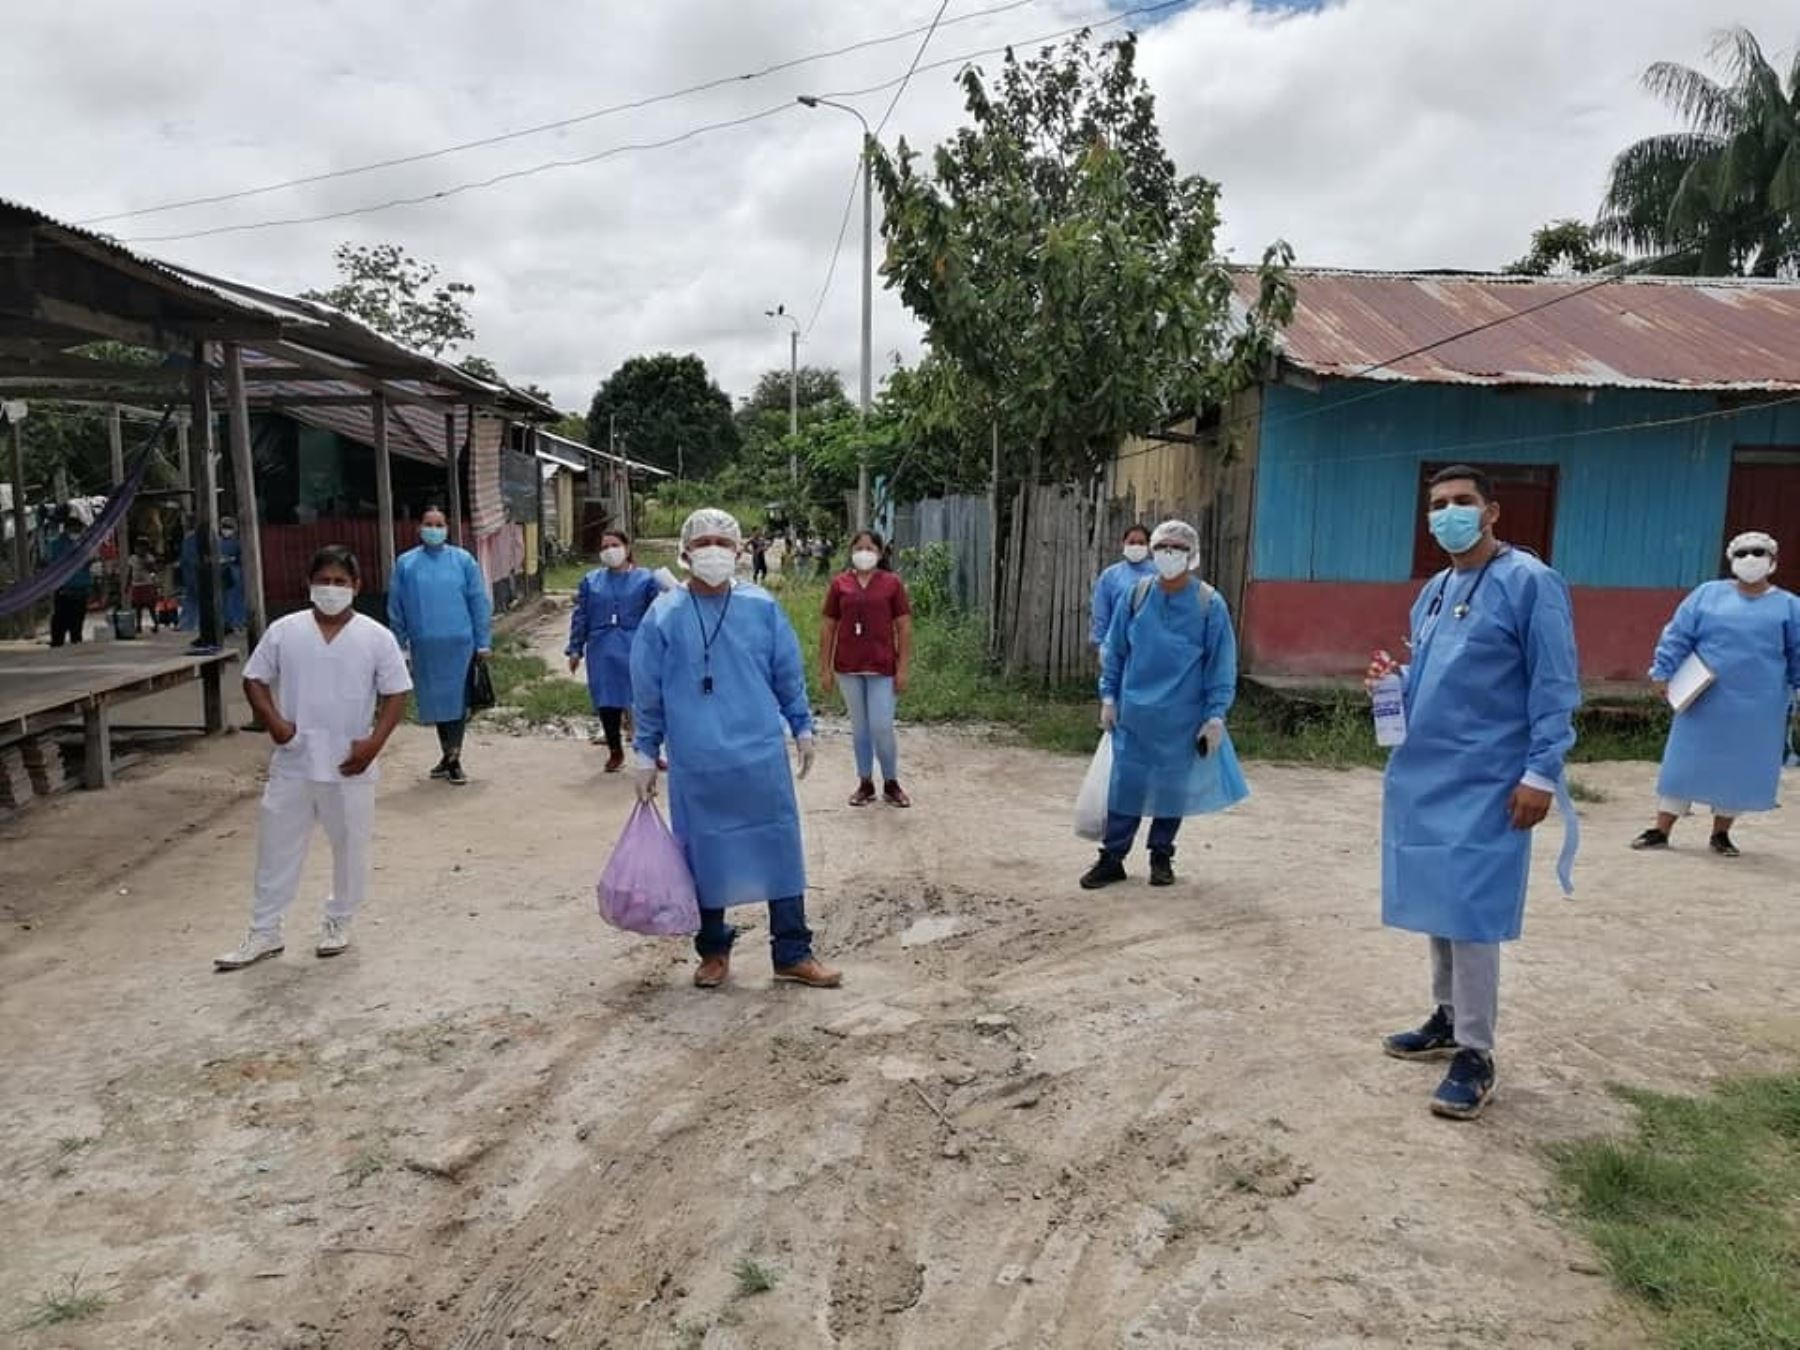 Loreto inicia la búsqueda temprana de casos sospechosos de covid-19 en Caballococha, para evitar que lleguen graves a hospitales. Foto: ANDINA/difusión.